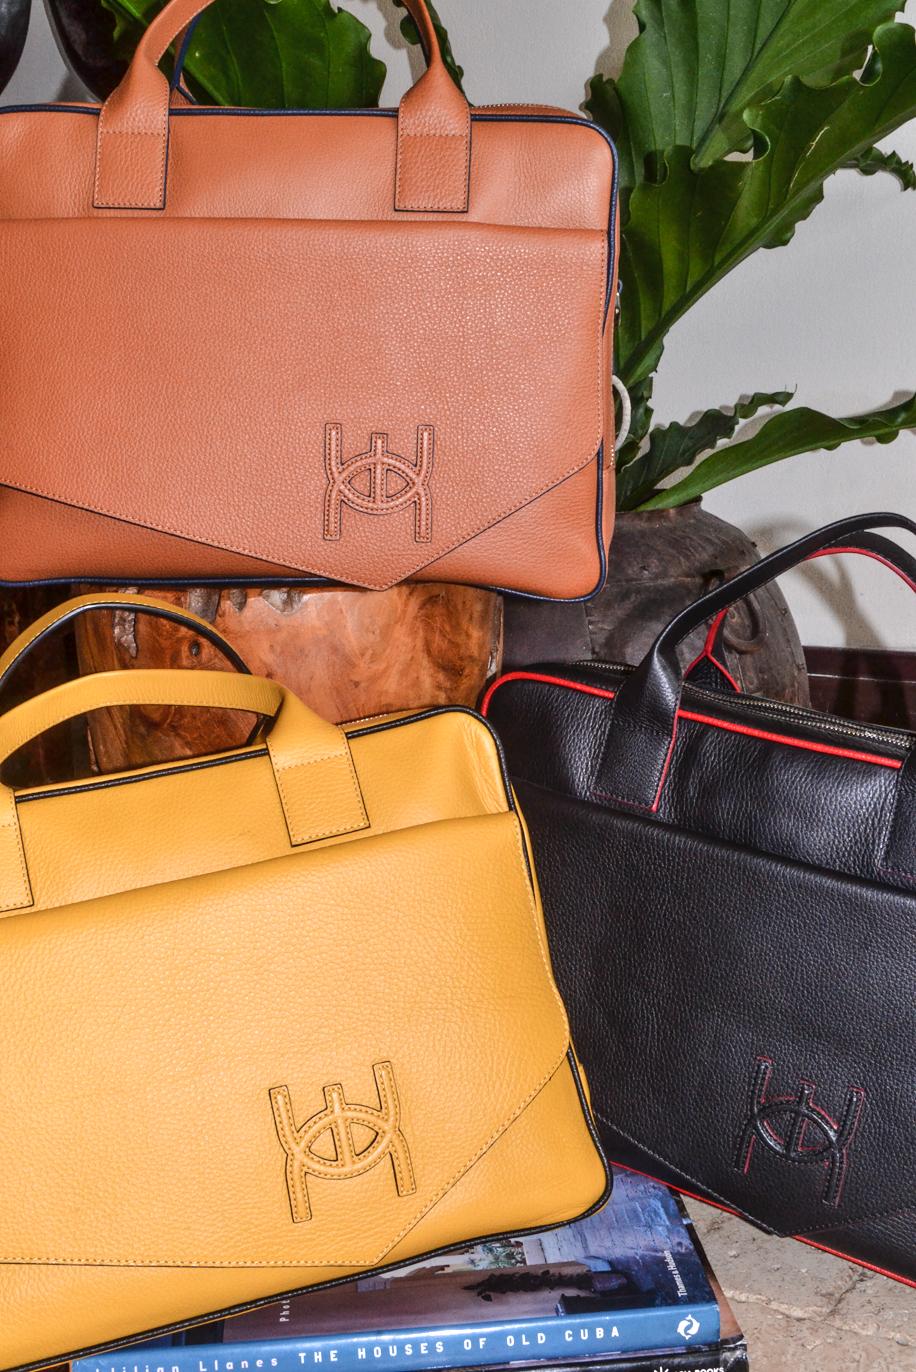 andrea-basilis-luxury-handbag-fashion-editorial-photographyilly-perez-fashion-liaison.PNG